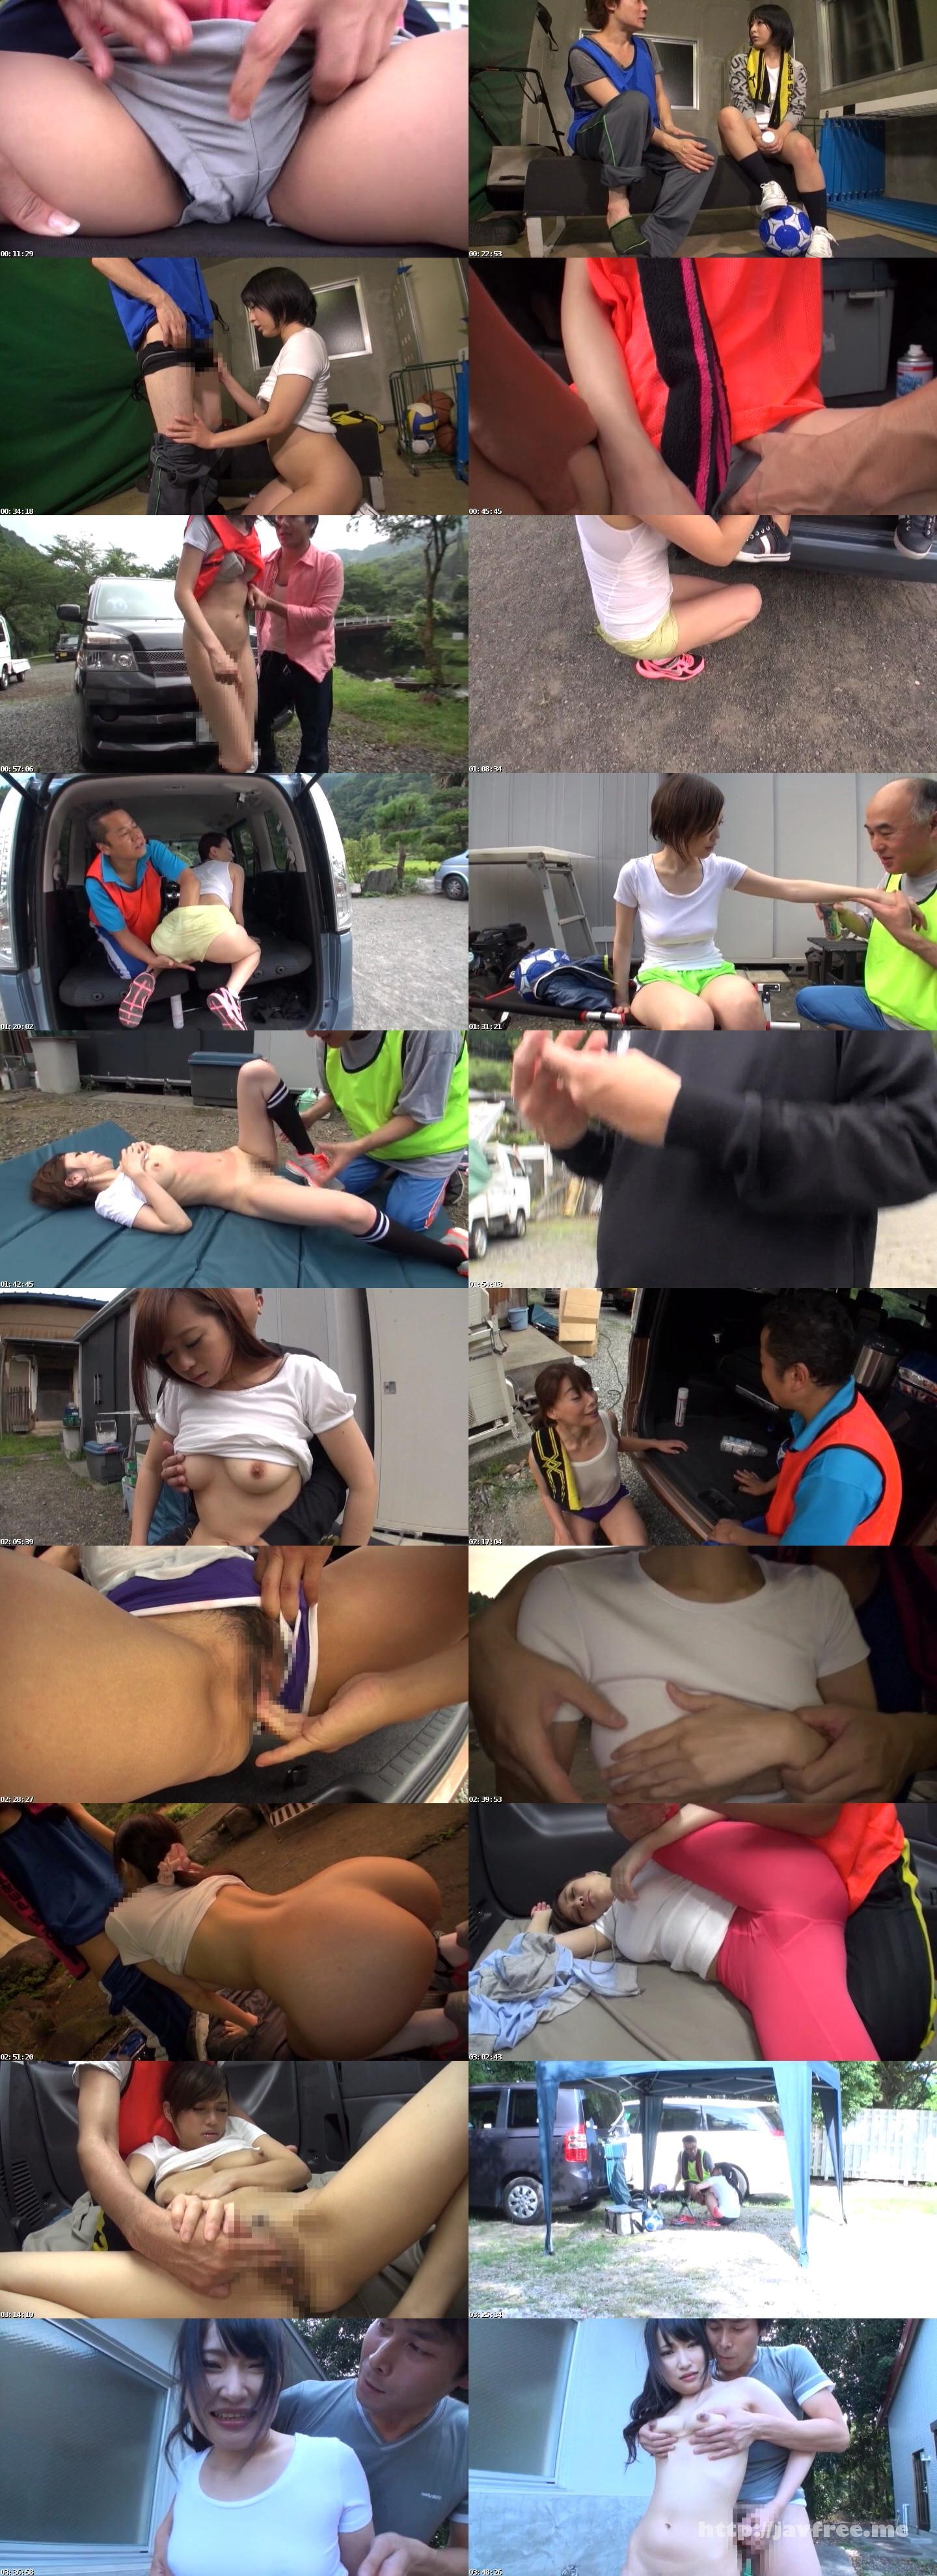 [ONGP-004] フットサルチームにいる人妻はエロカワ率高し!練習の合間にナンパして即ハメ中出し! - image ONGP-004 on https://javfree.me